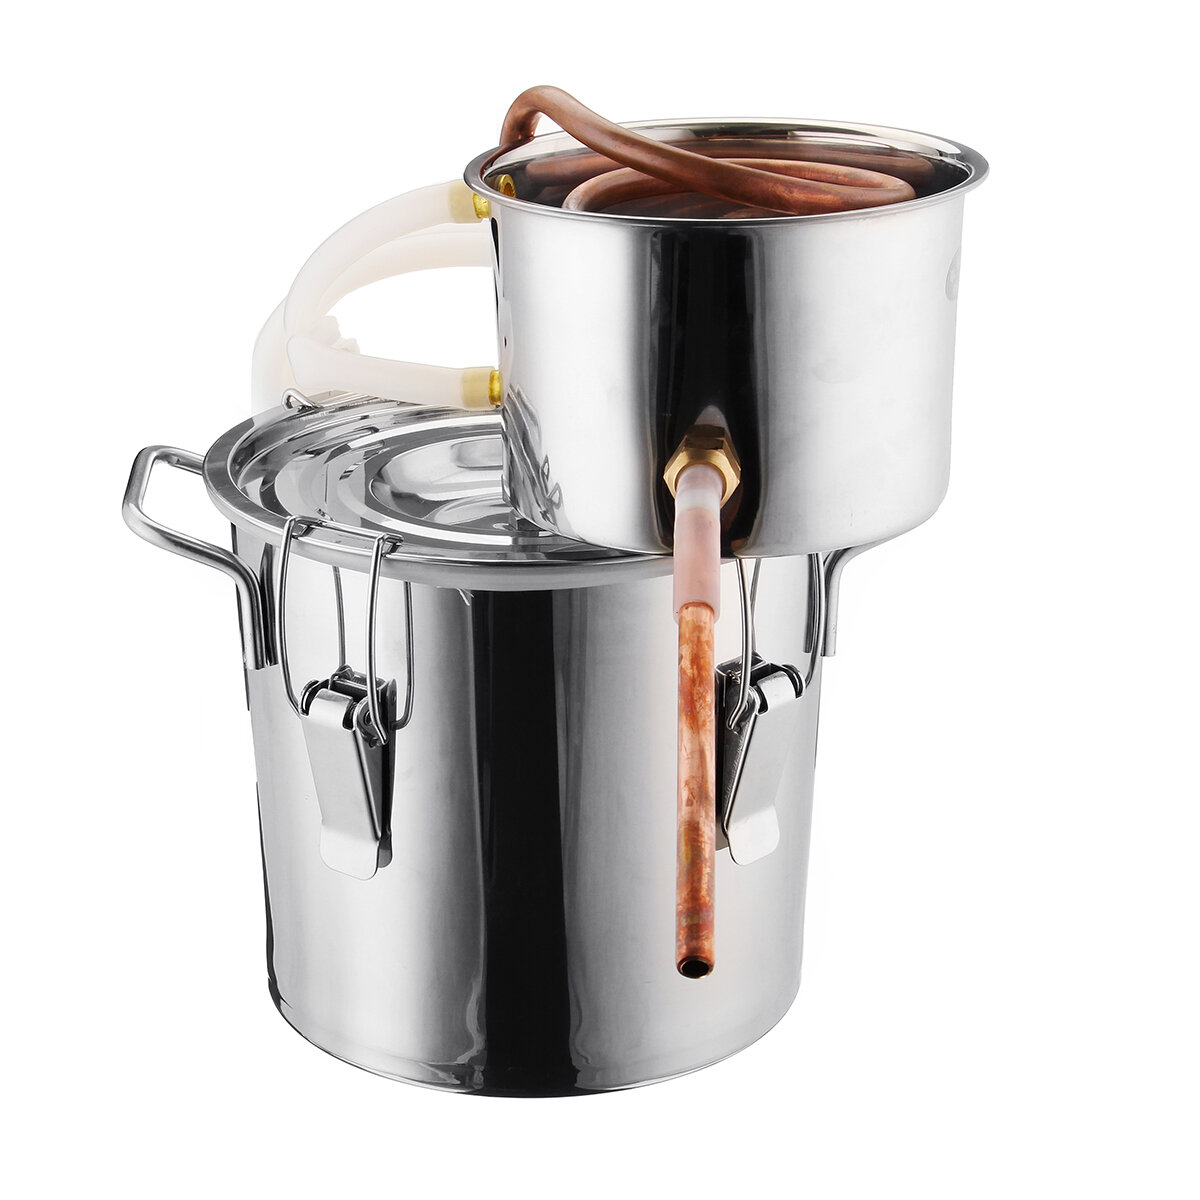 8L Alcohol Water Distiller Copper Wi-ne Making Tool Household Bar Sets Kitchen